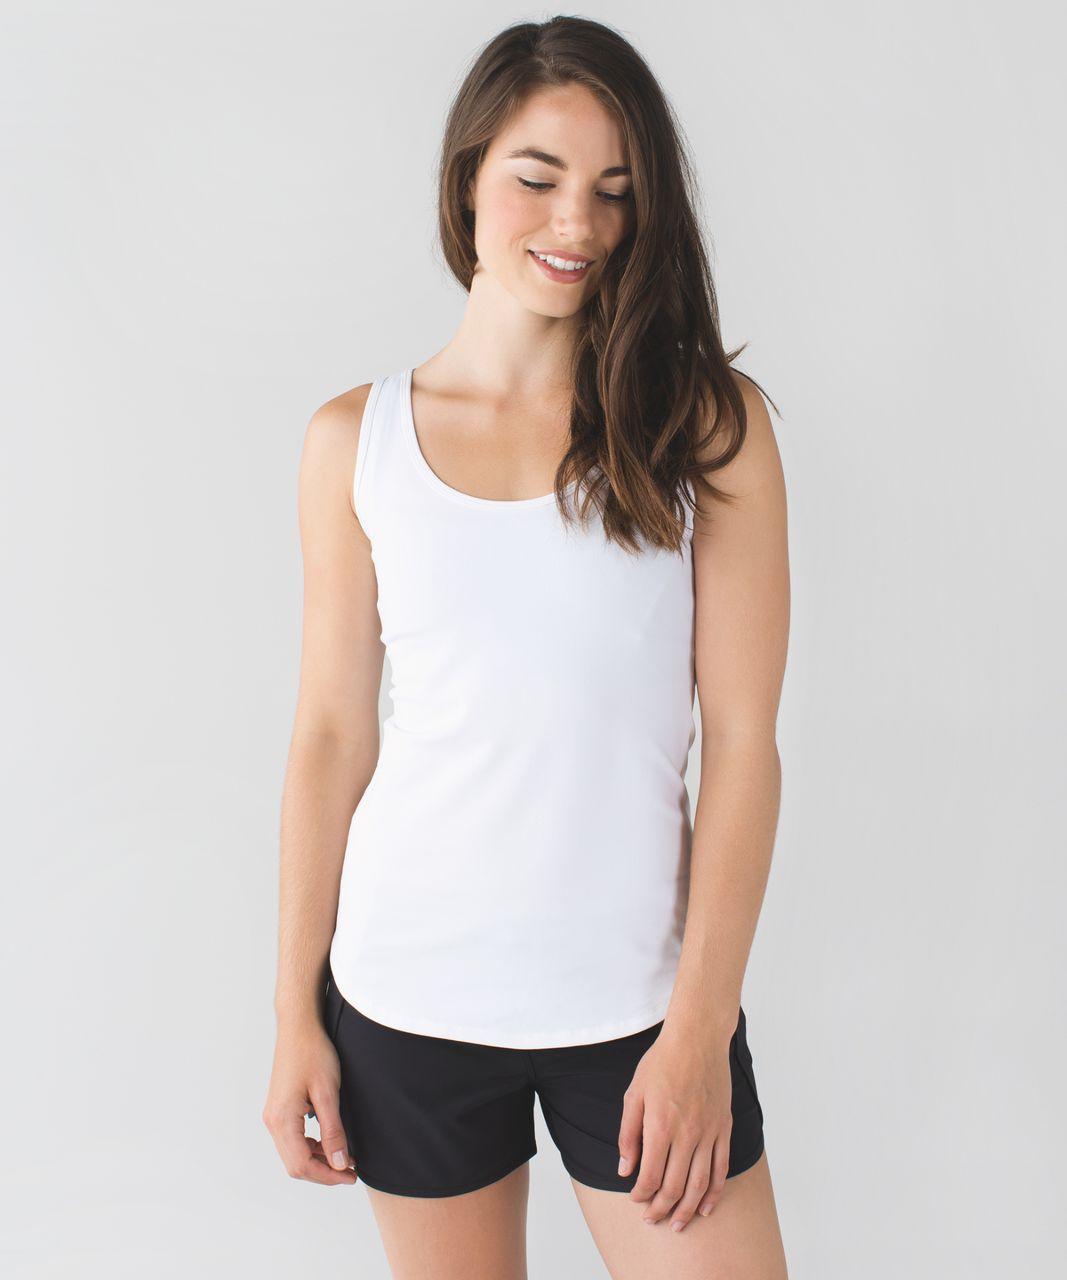 Lululemon Straight Up Tank - White